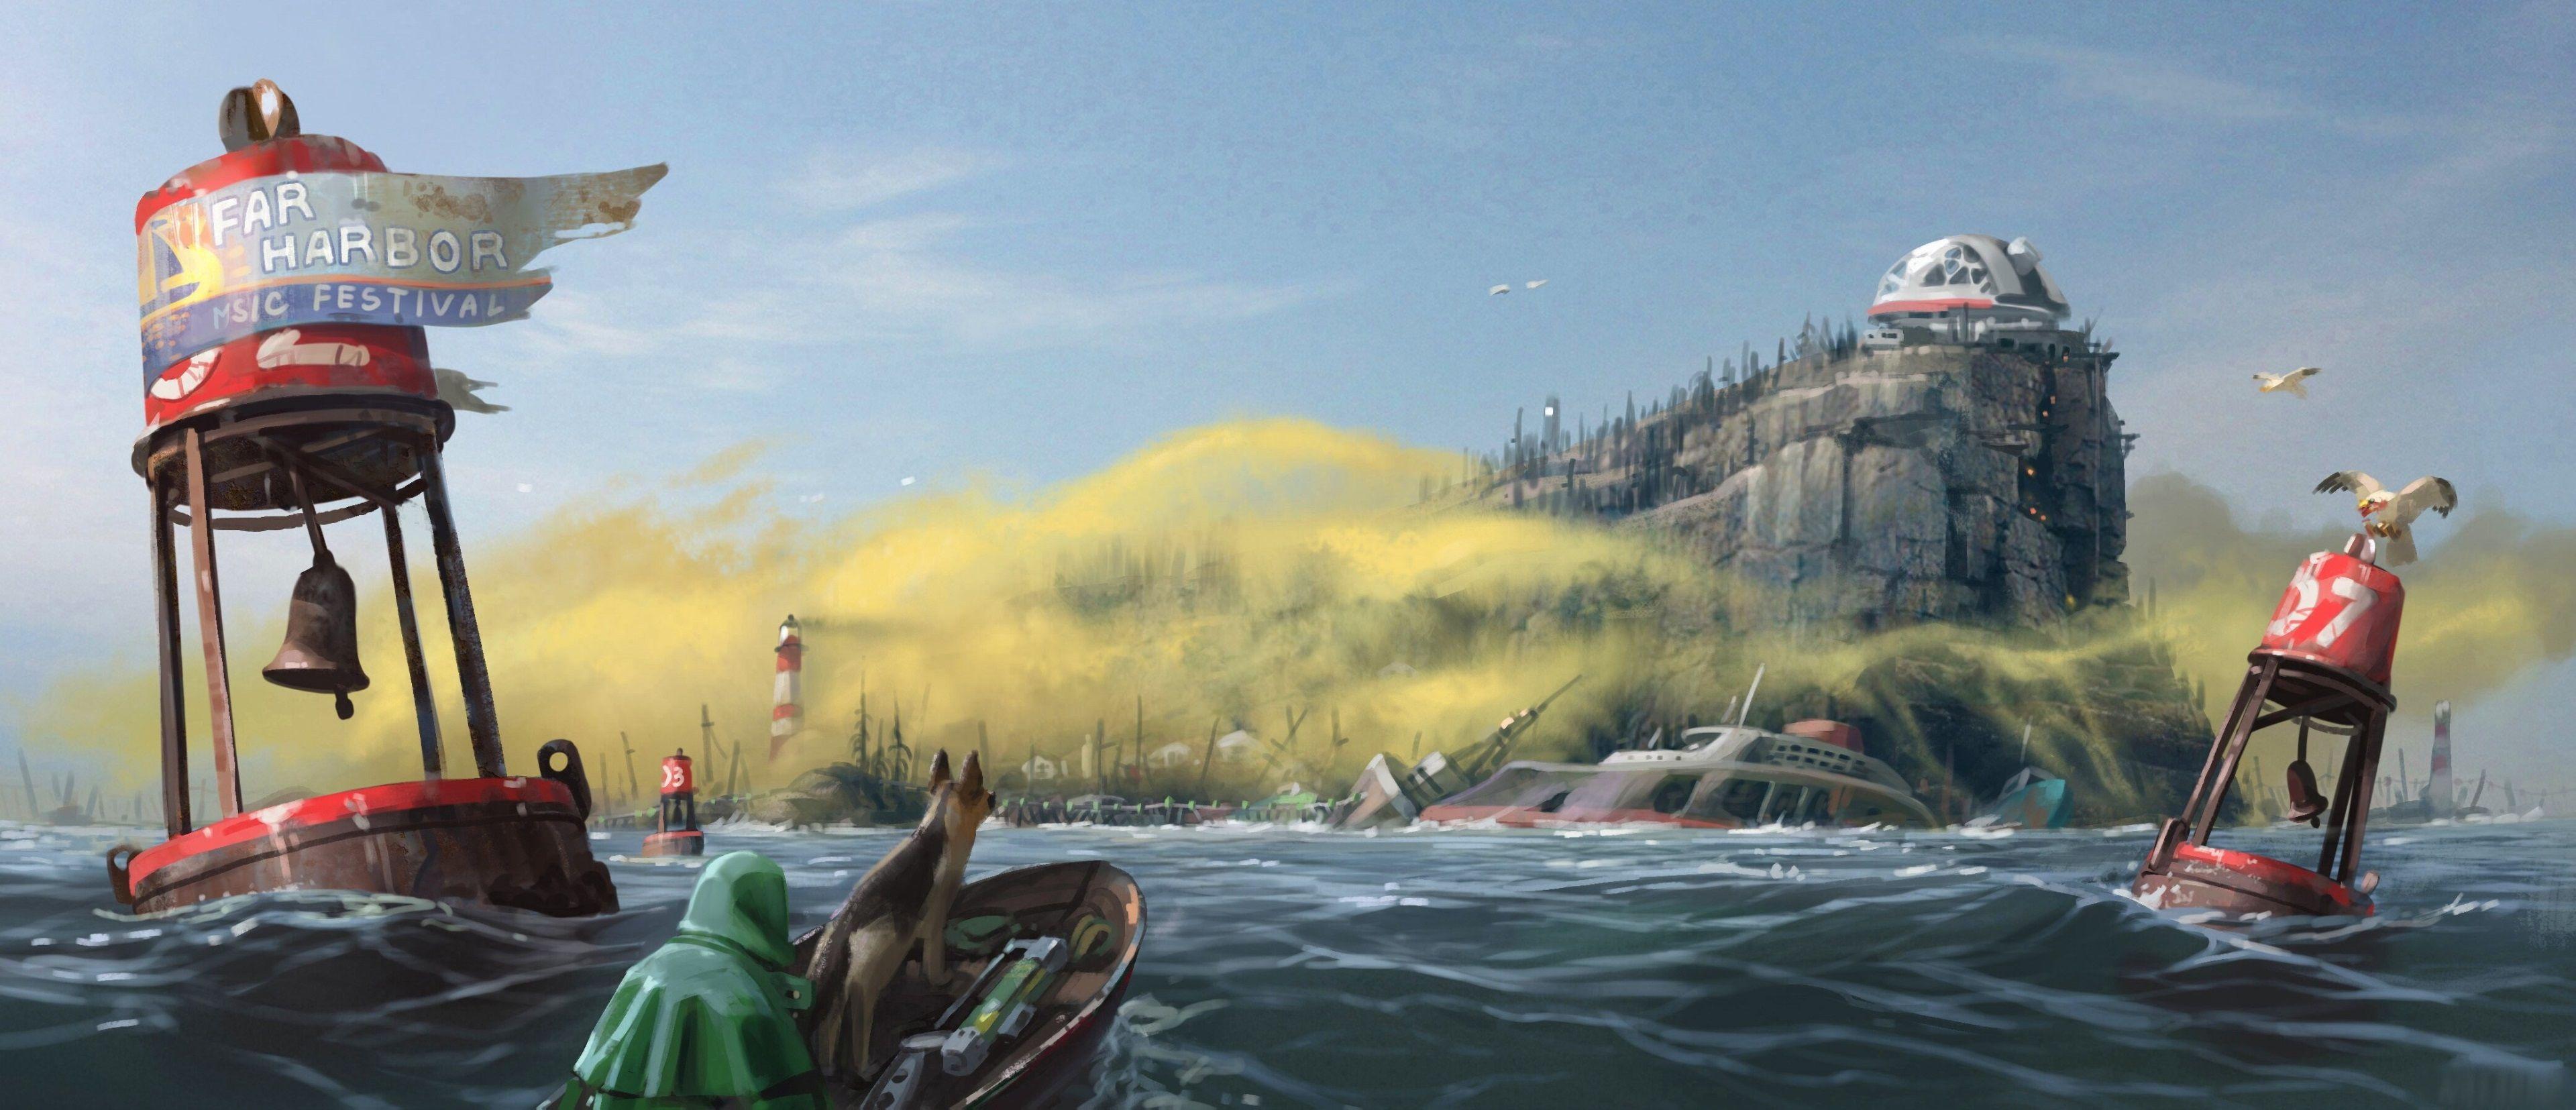 3840x1655 Fallout 4 Far Harbor 4k Free Download Wallpaper Fallout 4 Wallpapers Fallout Art Concept Art